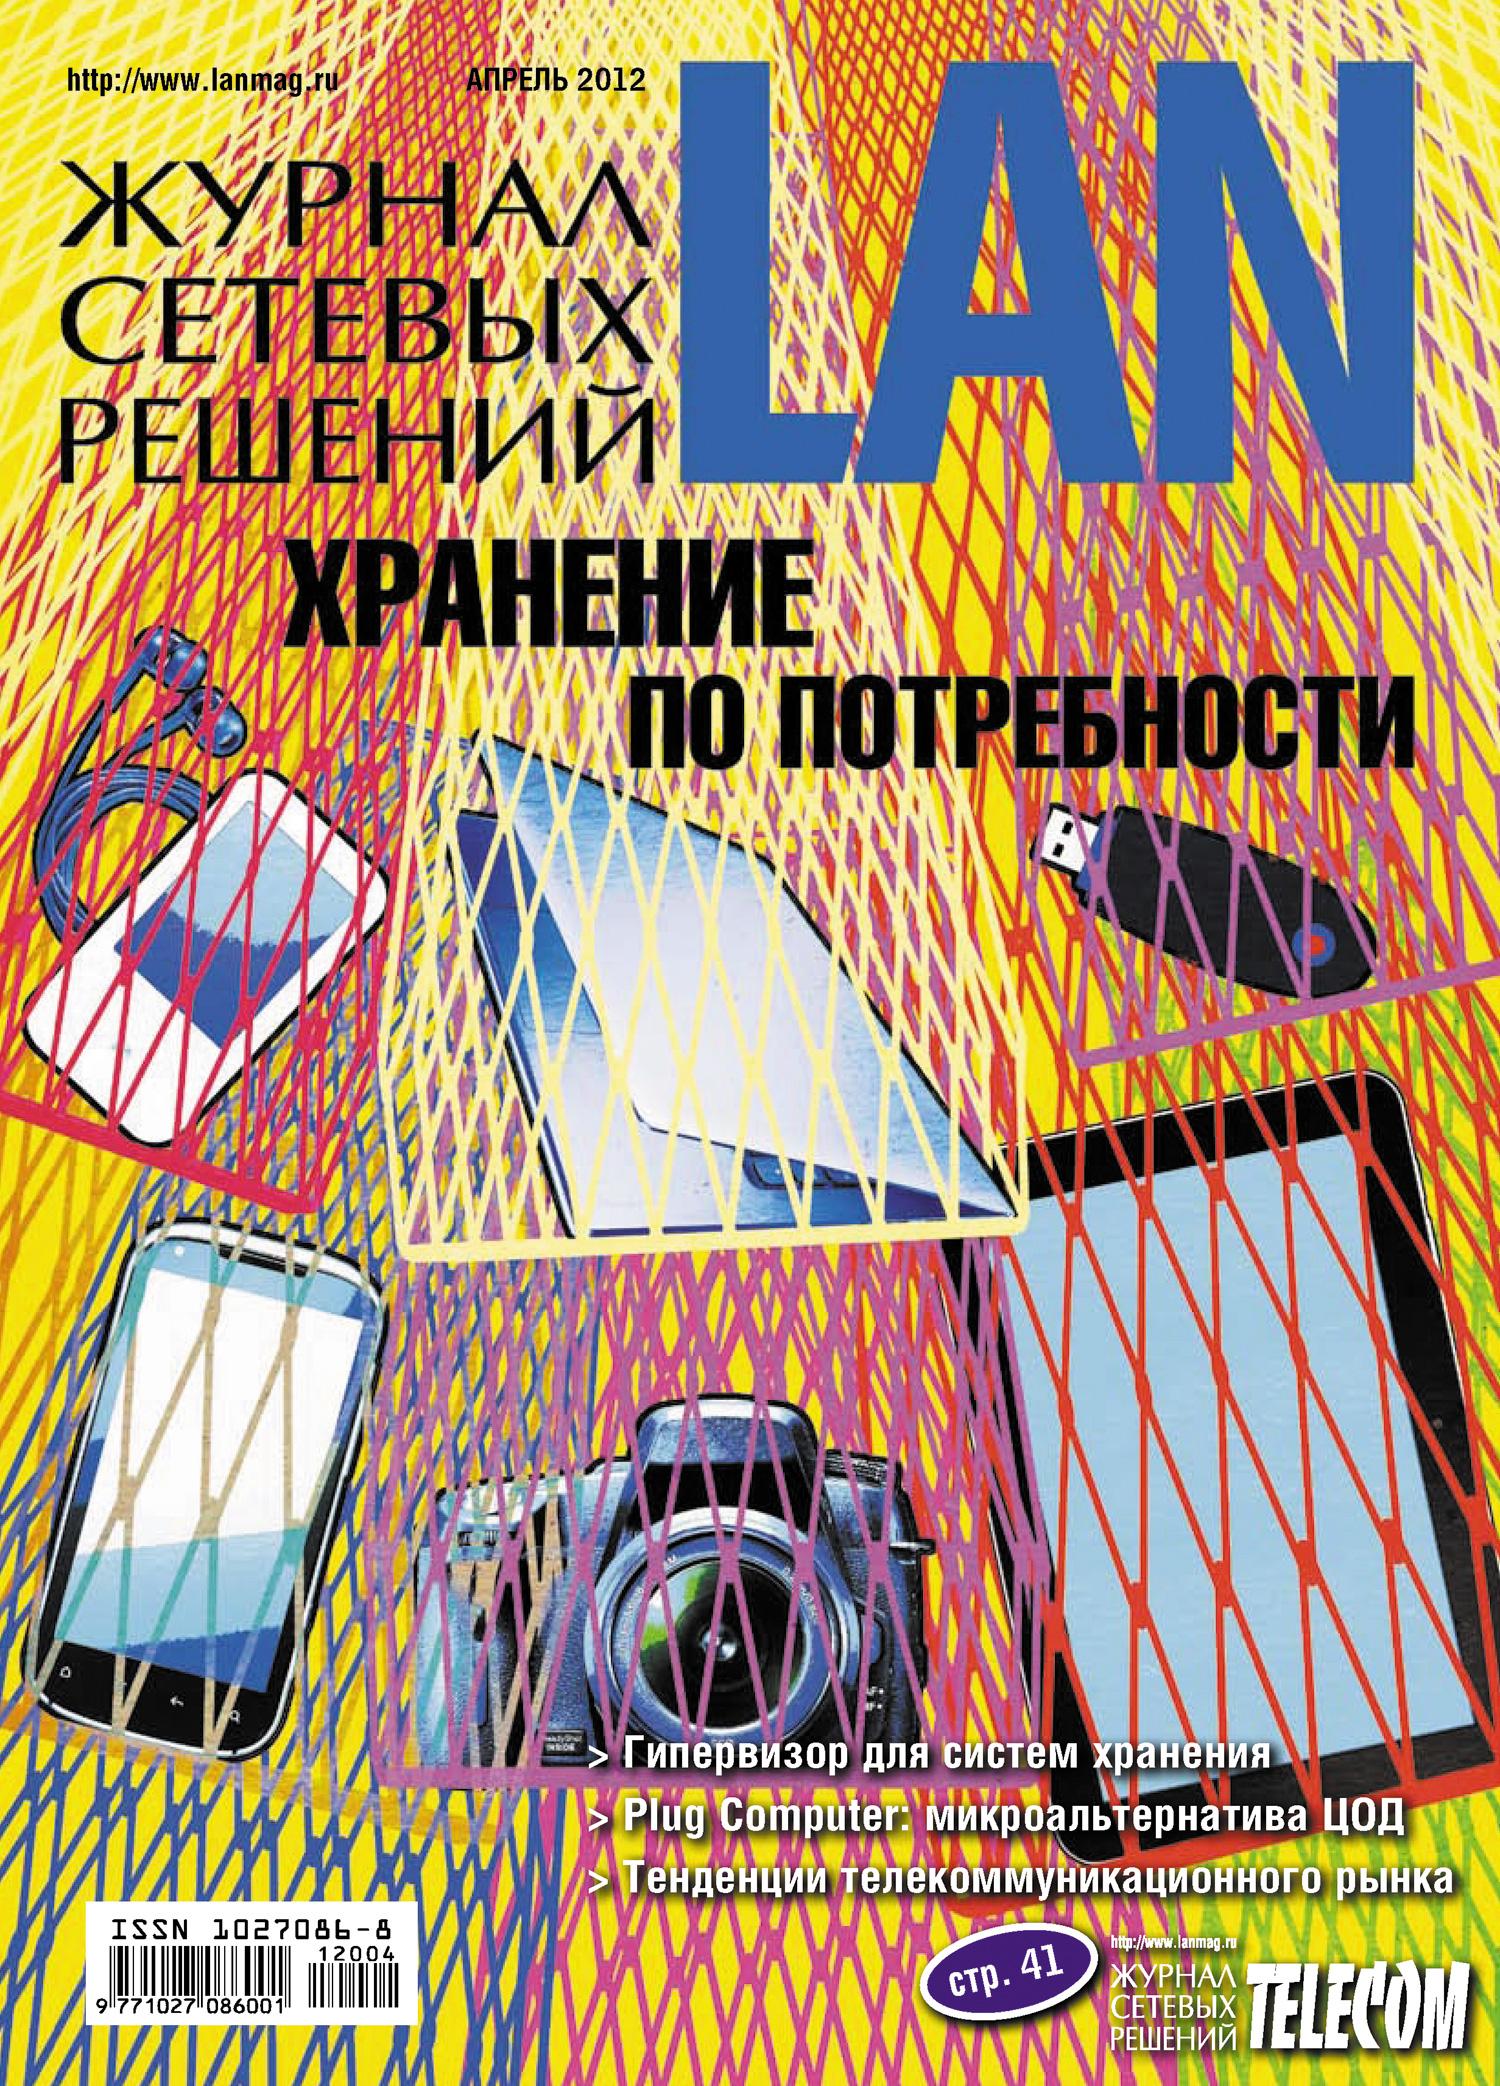 Журнал сетевых решений / LAN № 04/2012